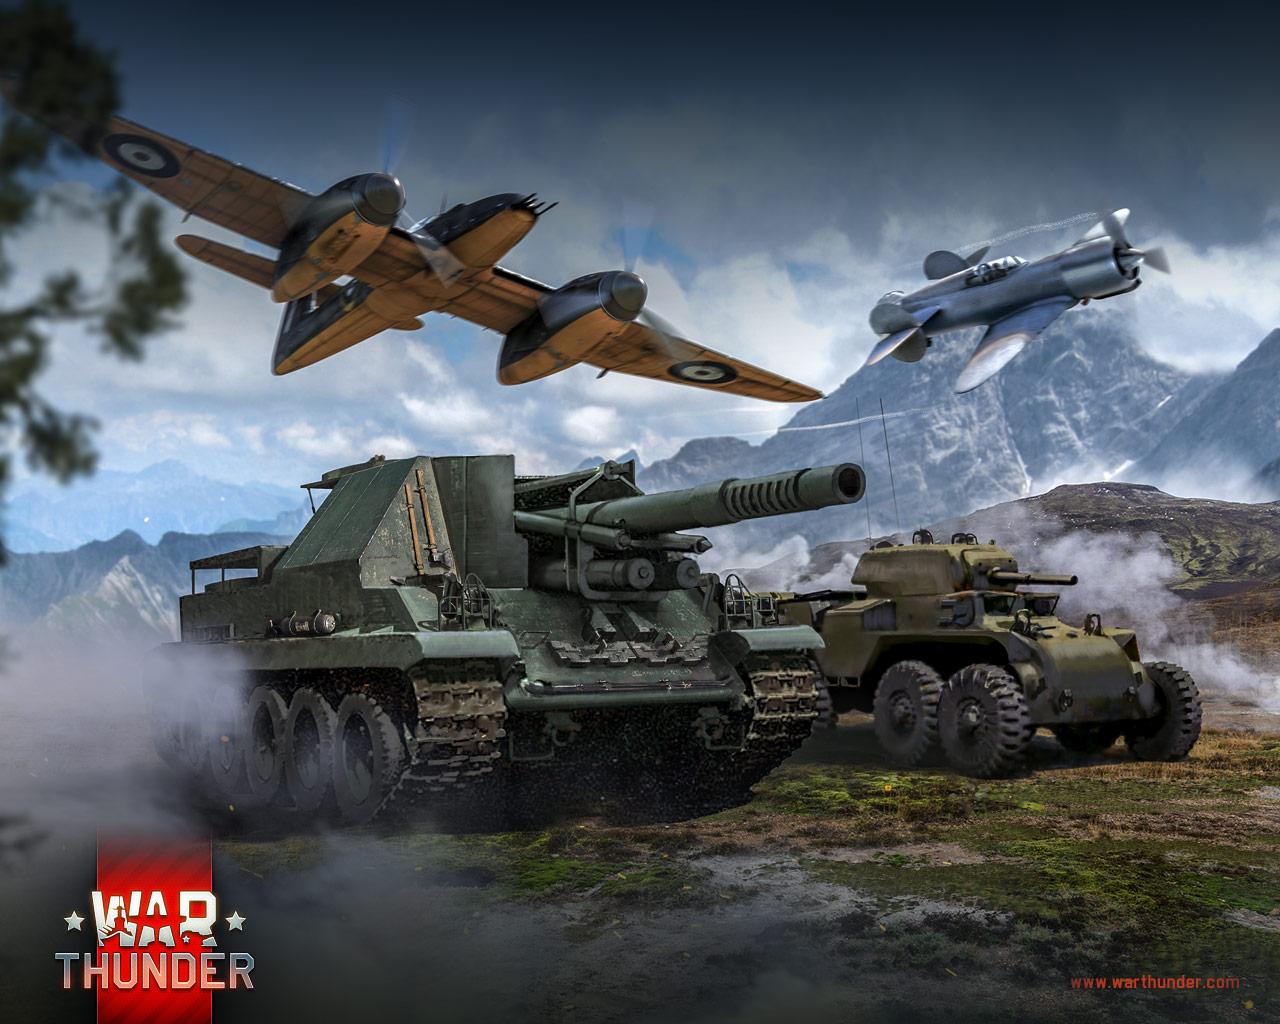 War Thunder PaГџwort VergeГџen